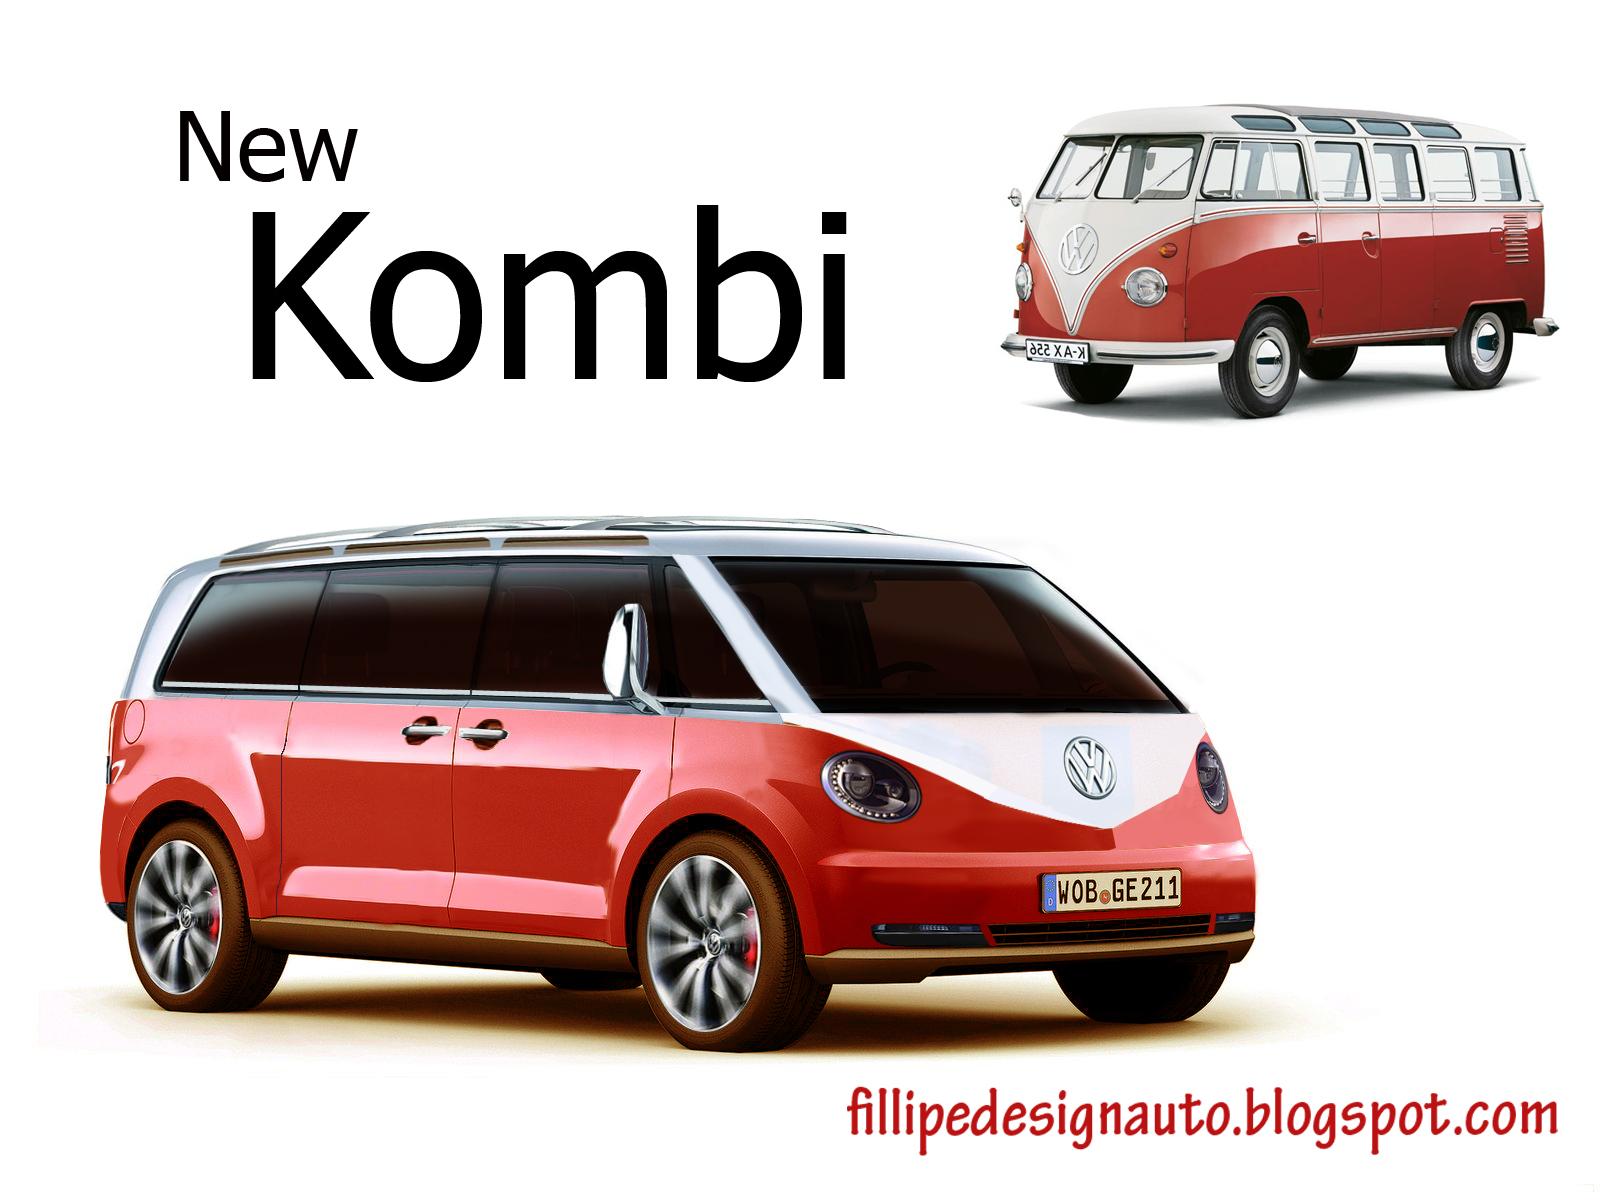 Vw Camper Vans Kombi Campervan Hire Vanagon Camper Autos